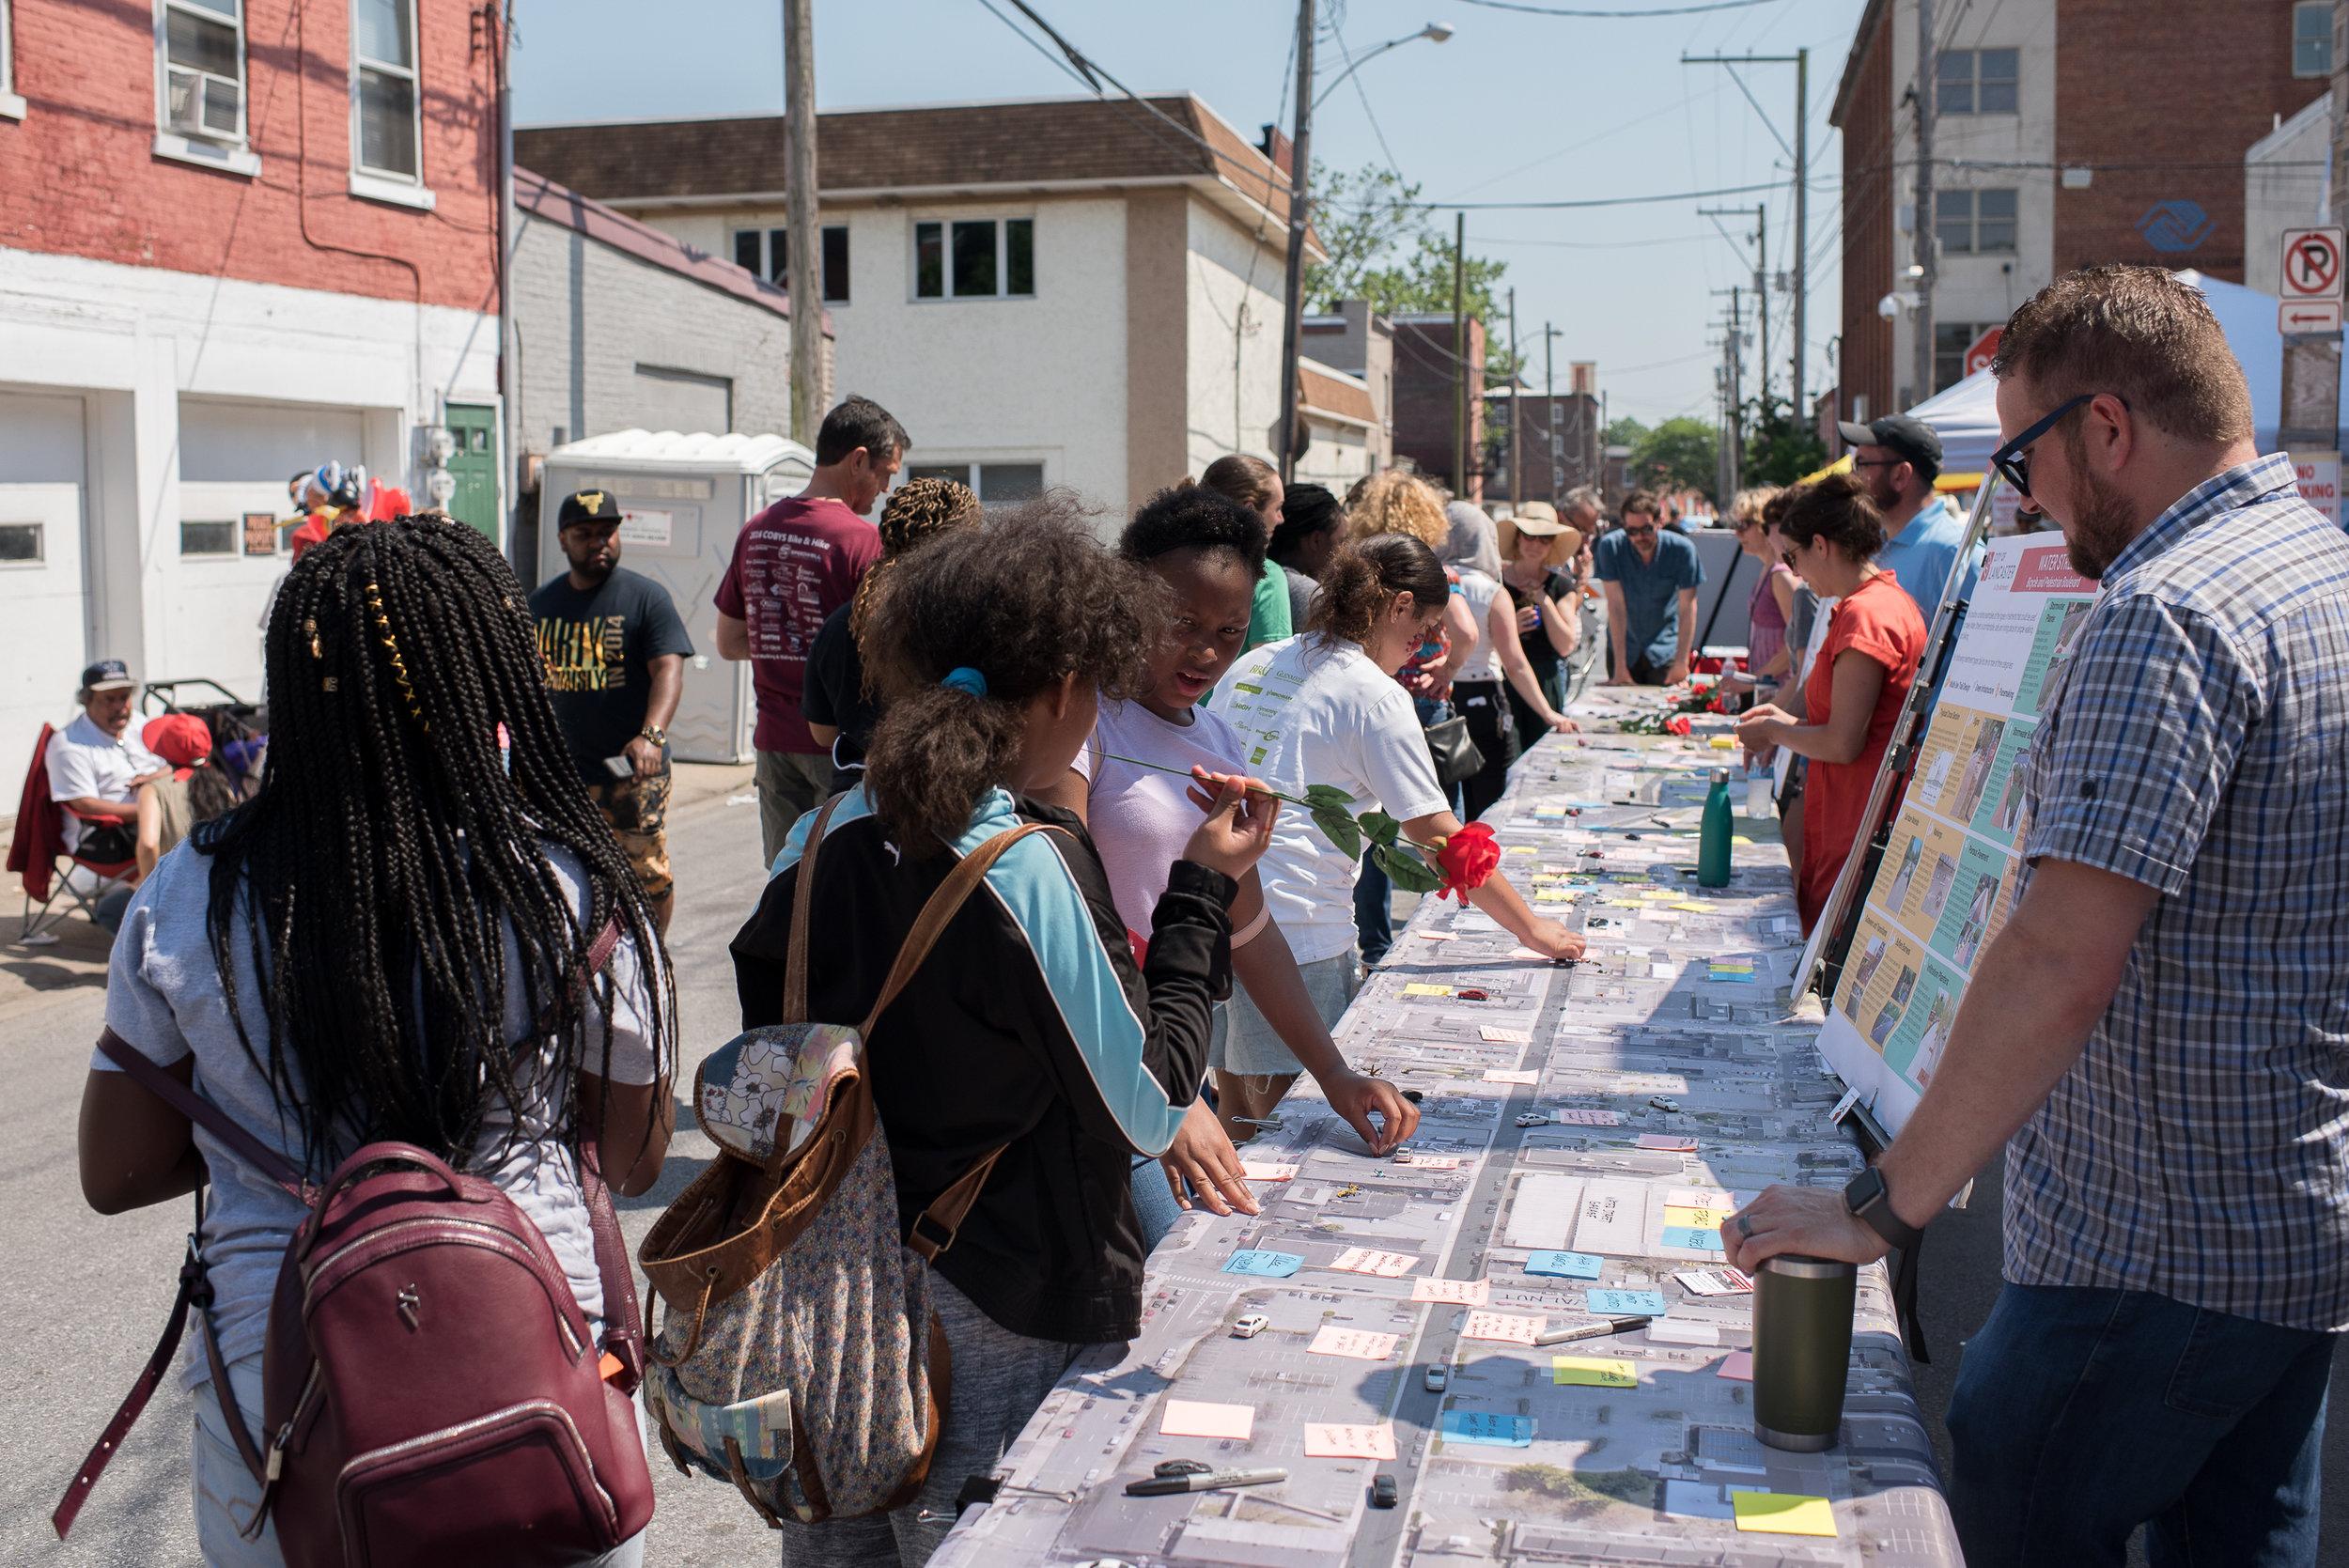 Open Streets, Water Street Outreach - Sara Code Kroll